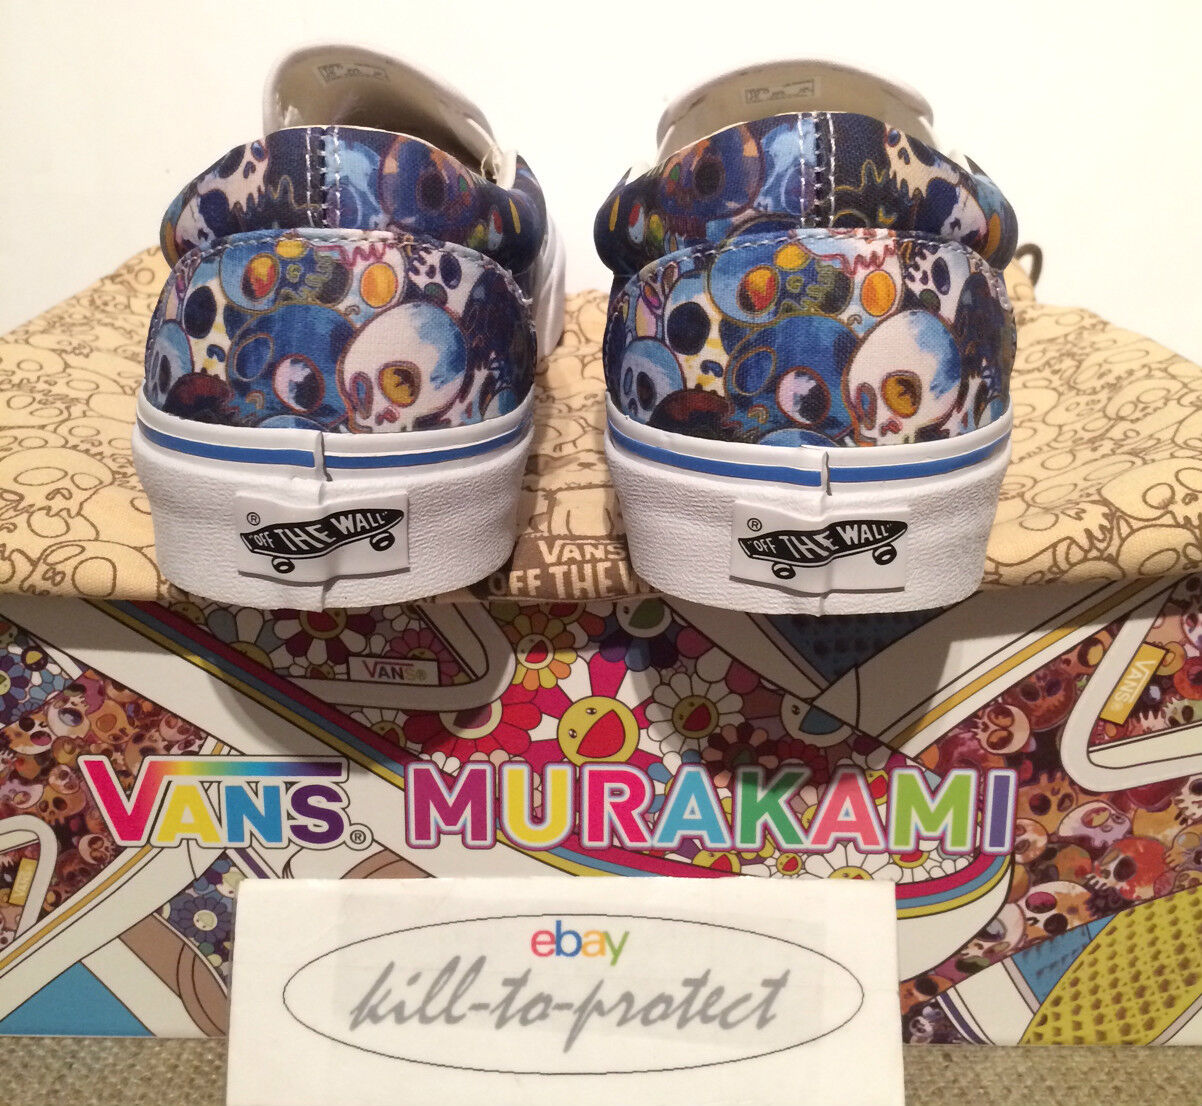 Vans x SZ takashi murakami bleu crâne SZ x nous UK6 7 8 9 10 11 classic slip on 2015 d92817